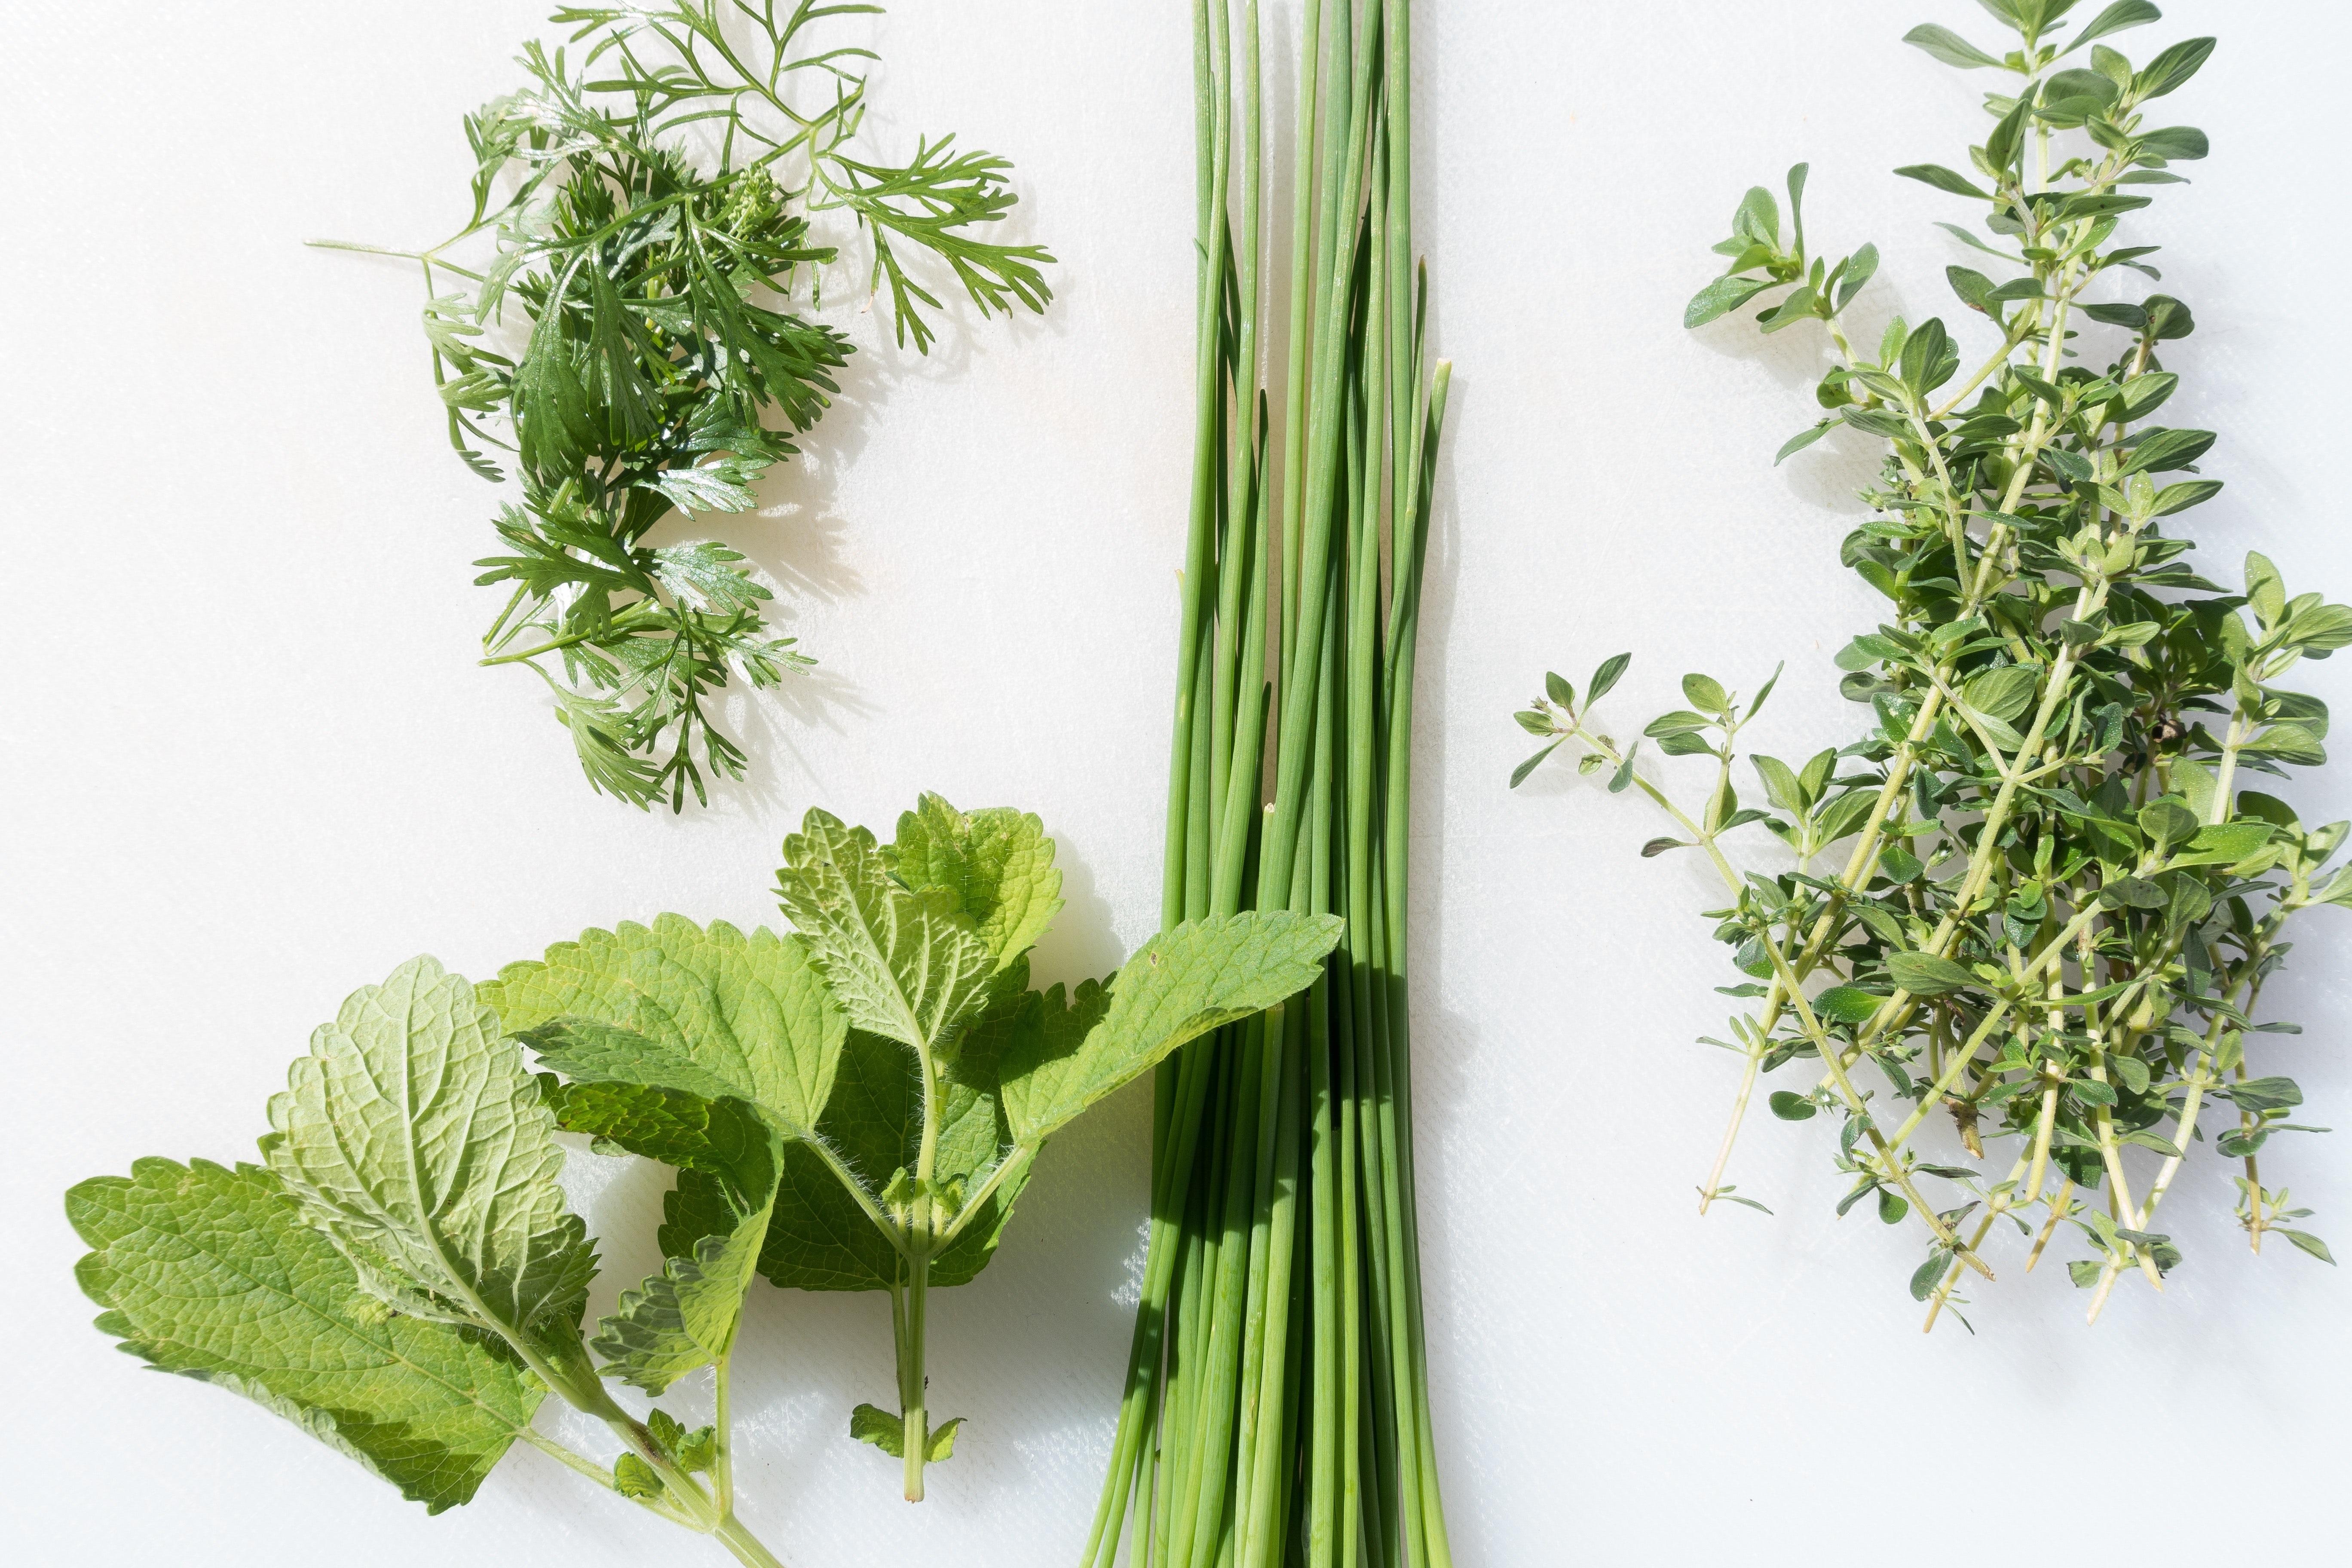 Herbes (persil, romarin, thym...)